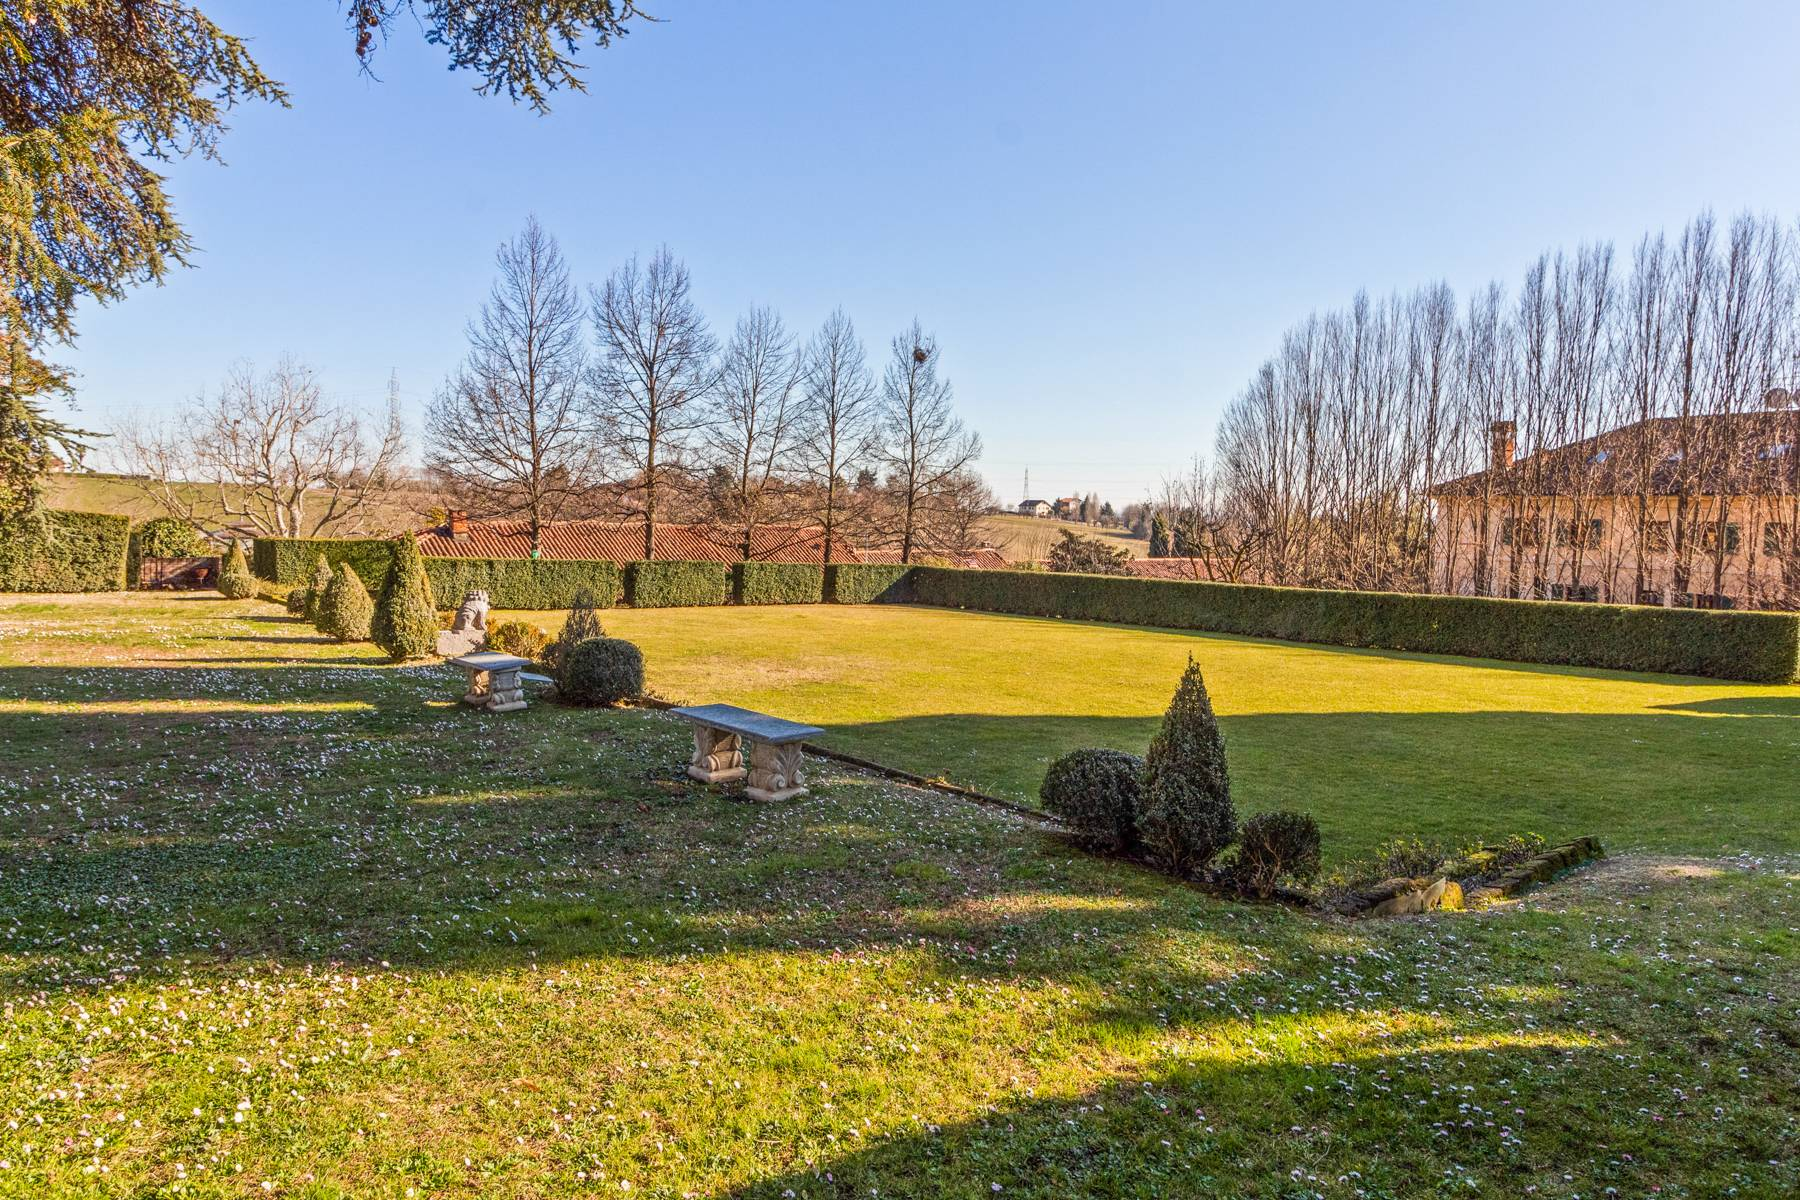 Villa in Vendita a Pino Torinese: 5 locali, 2087 mq - Foto 17